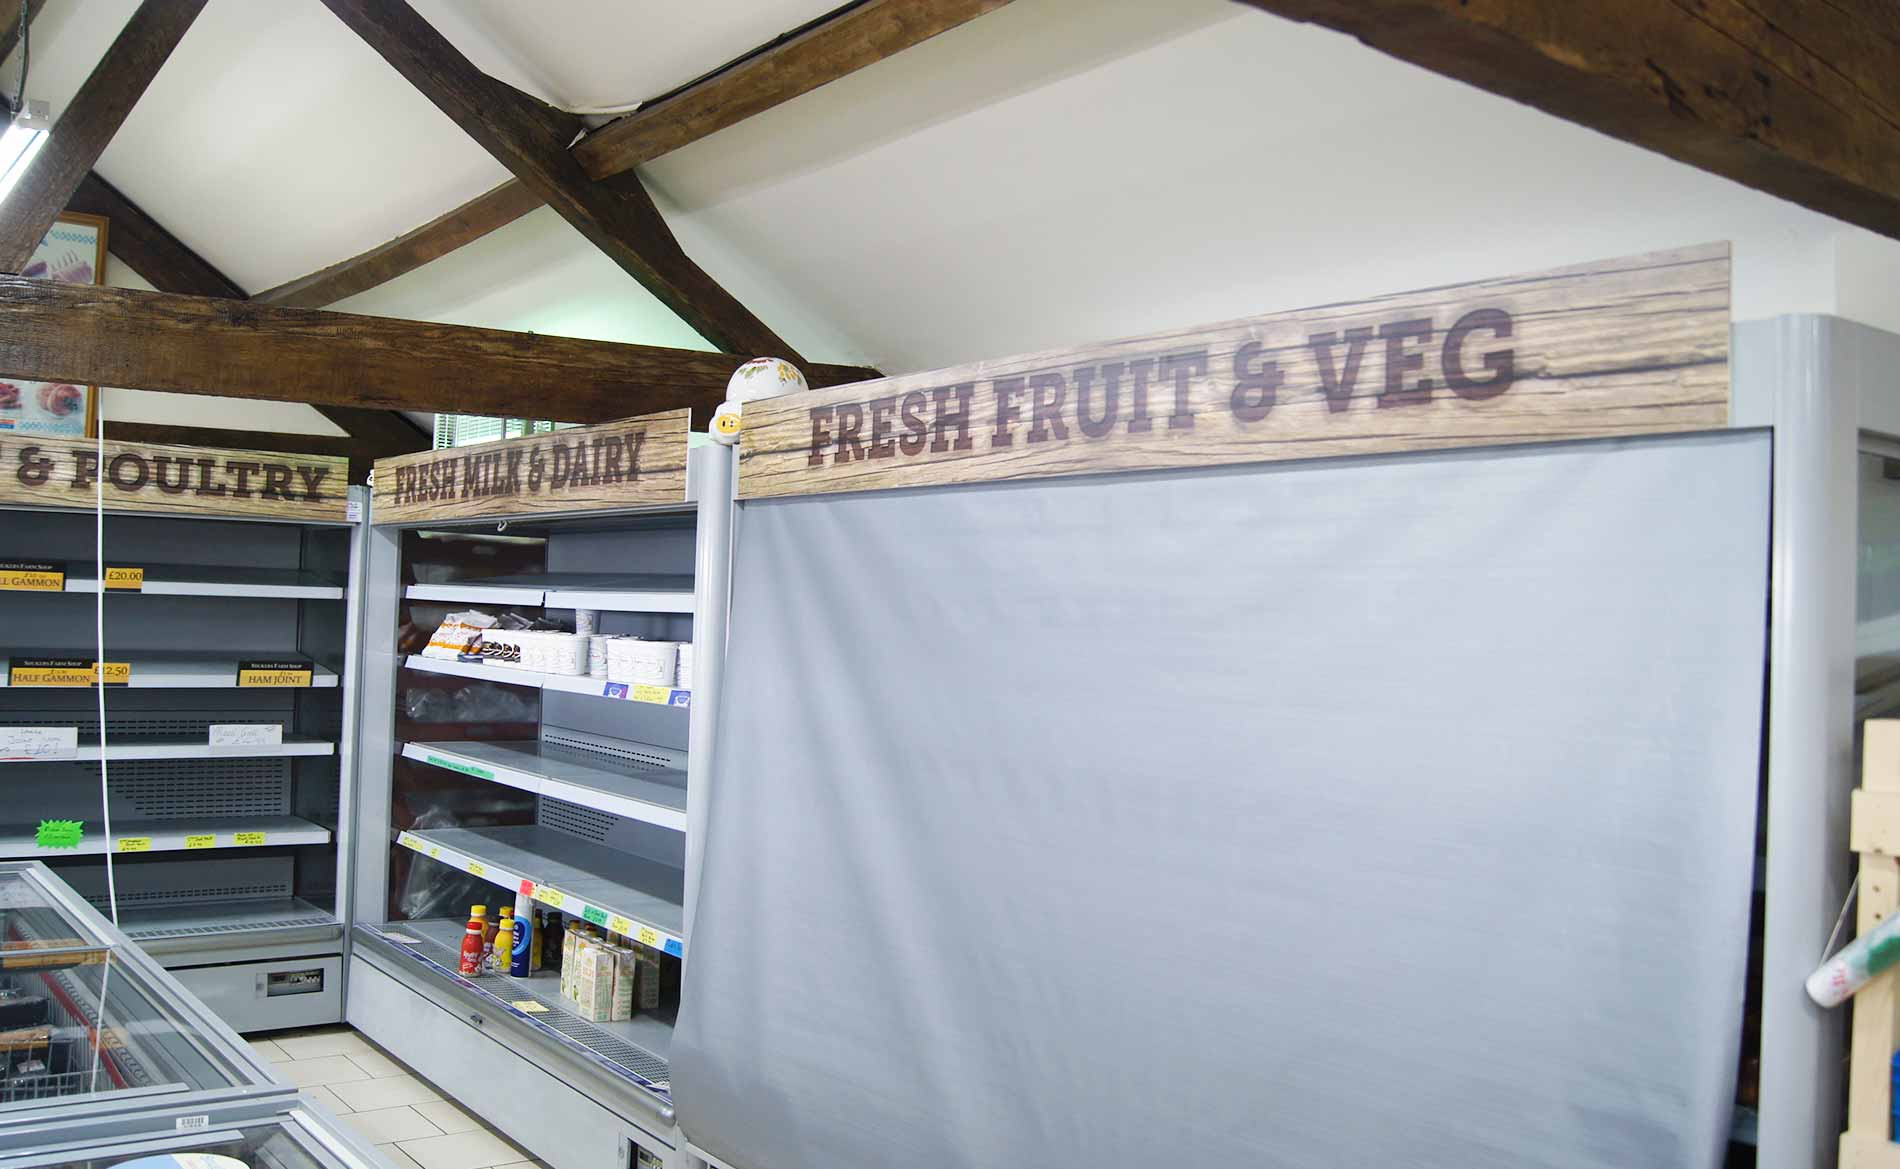 Signage, Shukers Farm Shop, Foamex/PVC Signs, Stoke-on-Trent, Staffordshire